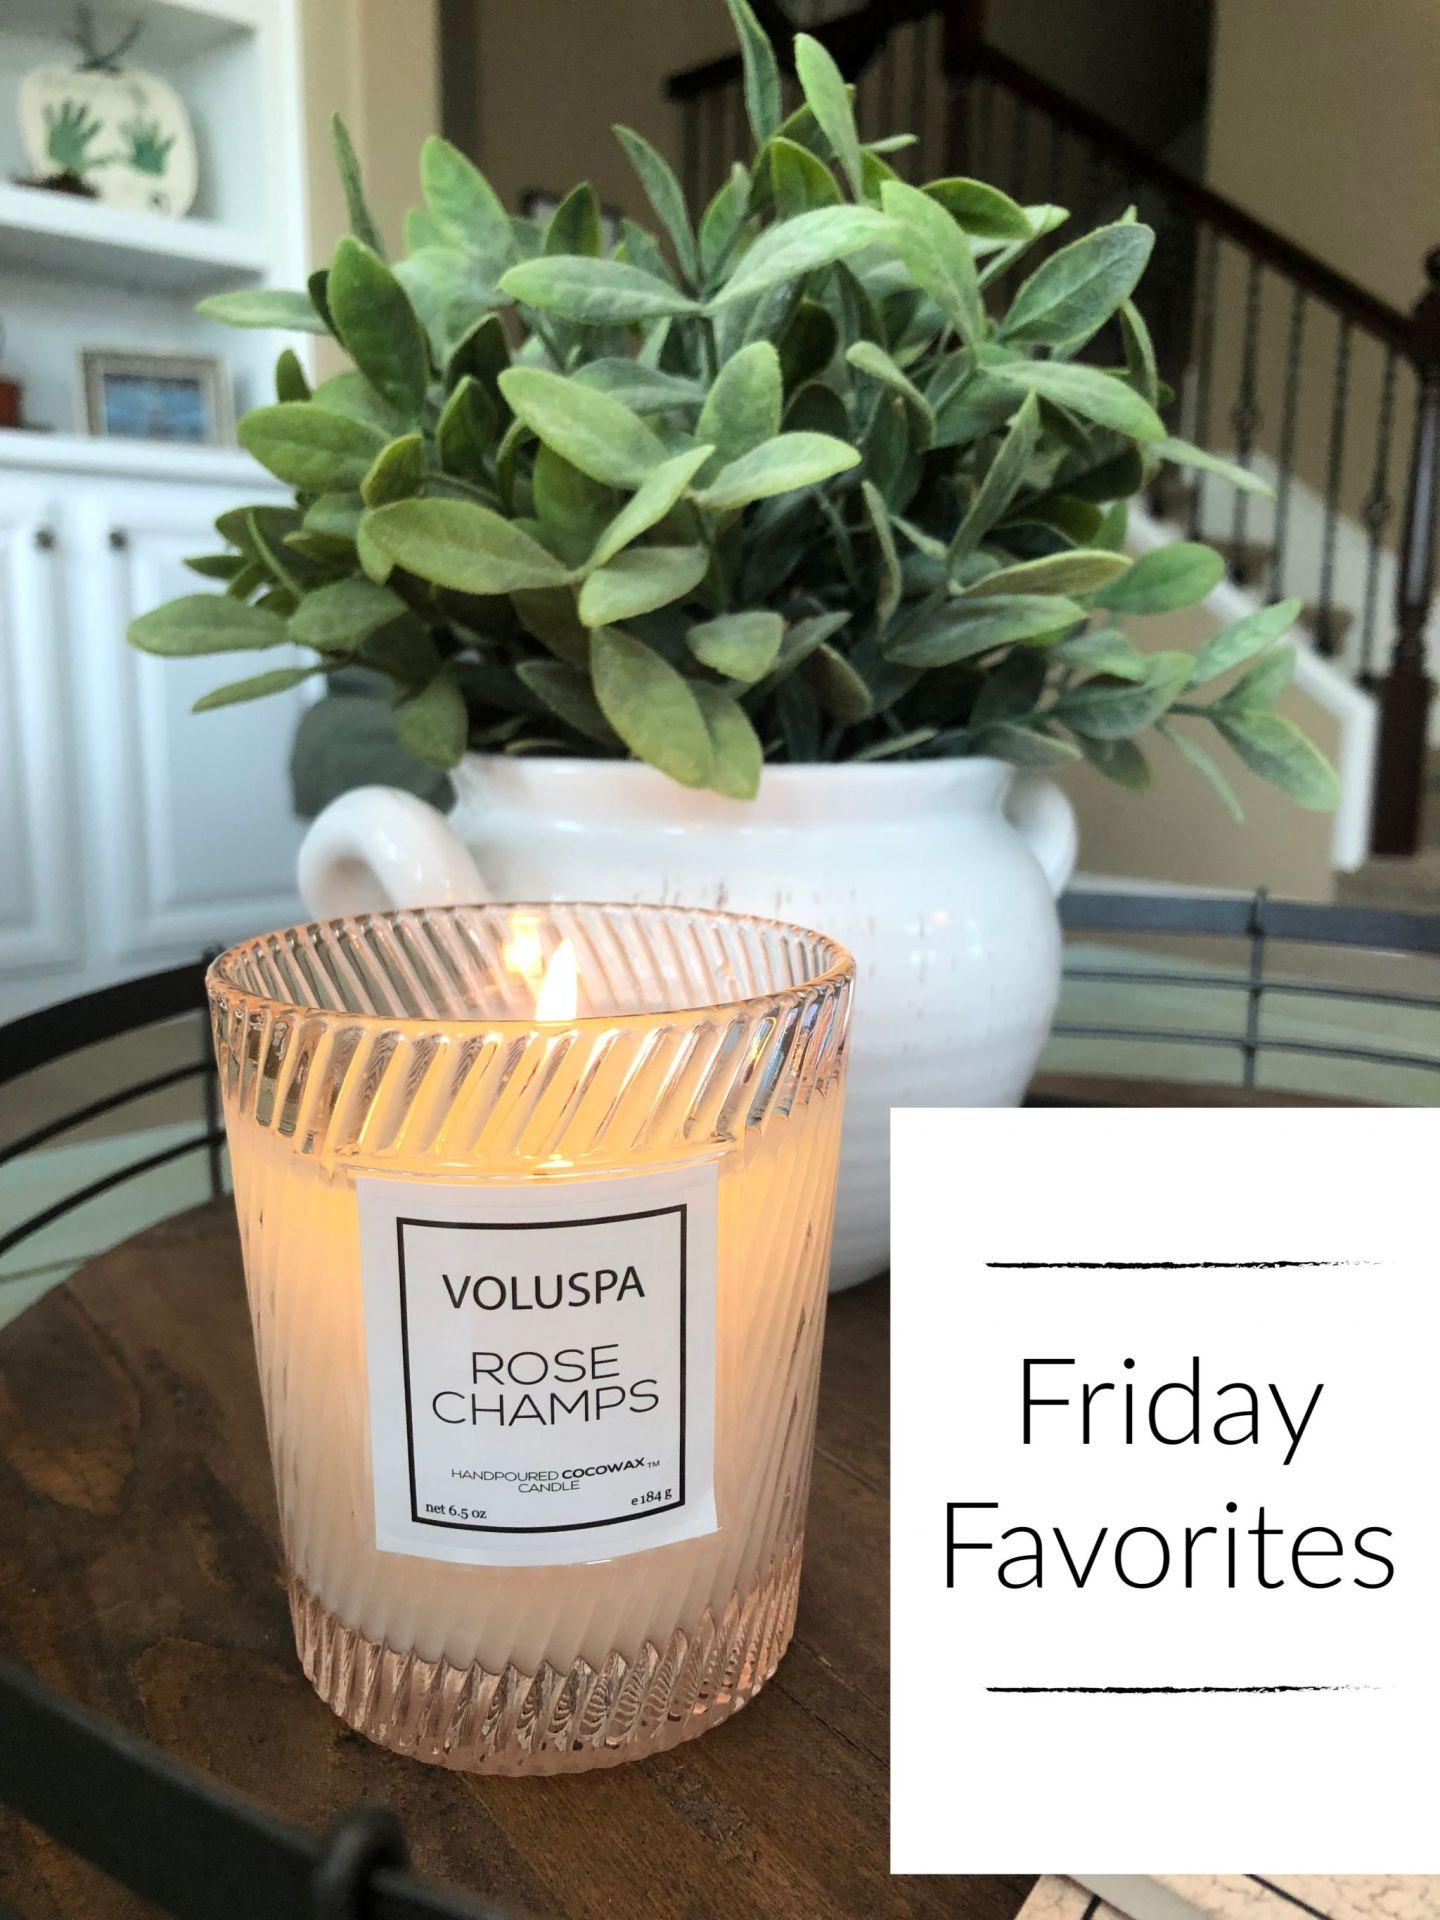 Friday Favorites #154